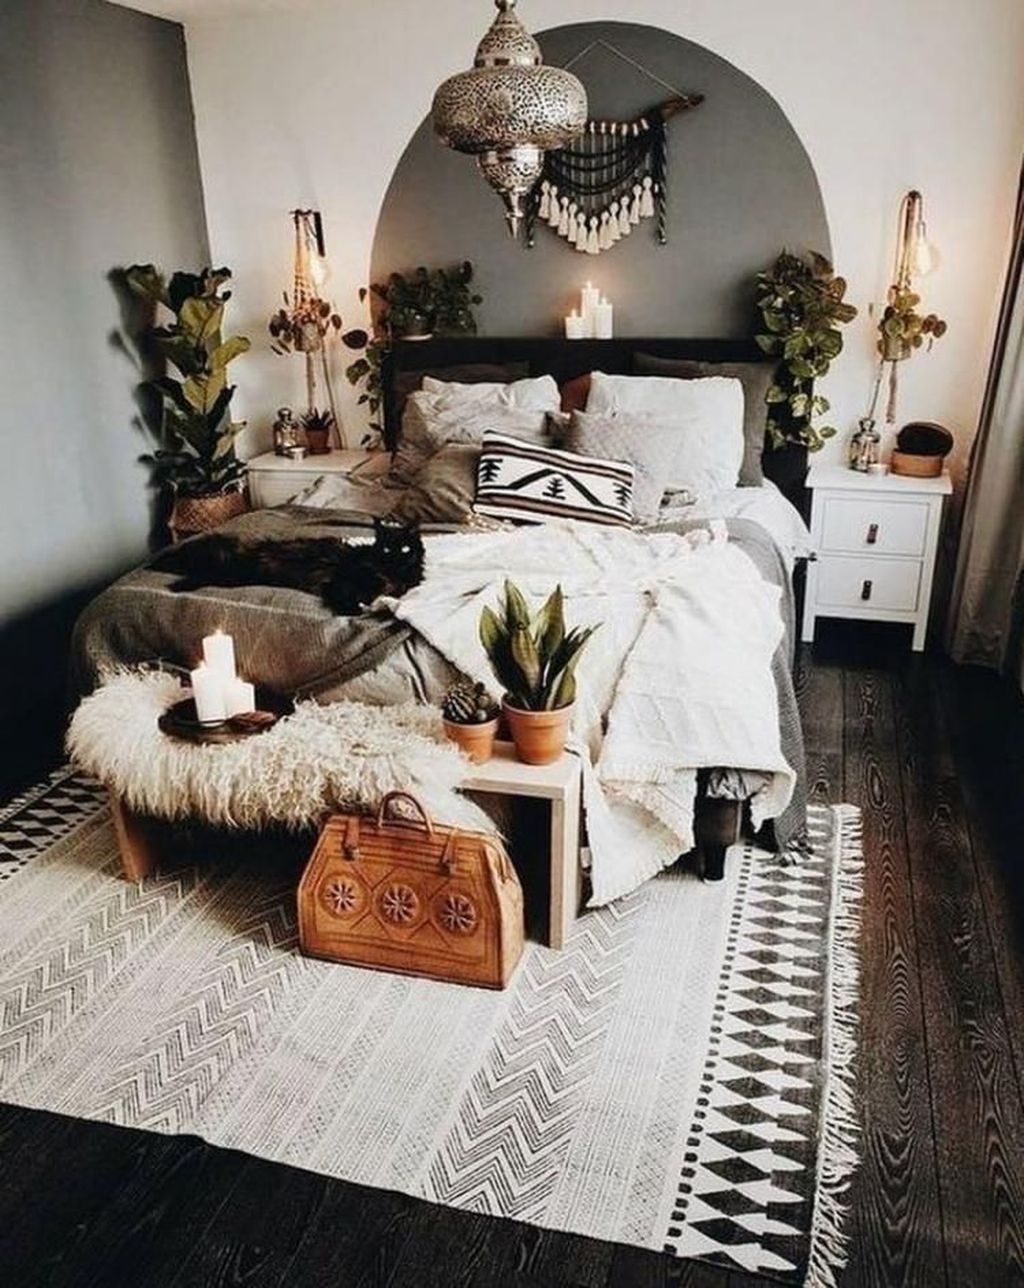 Fabulous Diy Bedroom Decor Ideas To Inspire You 33